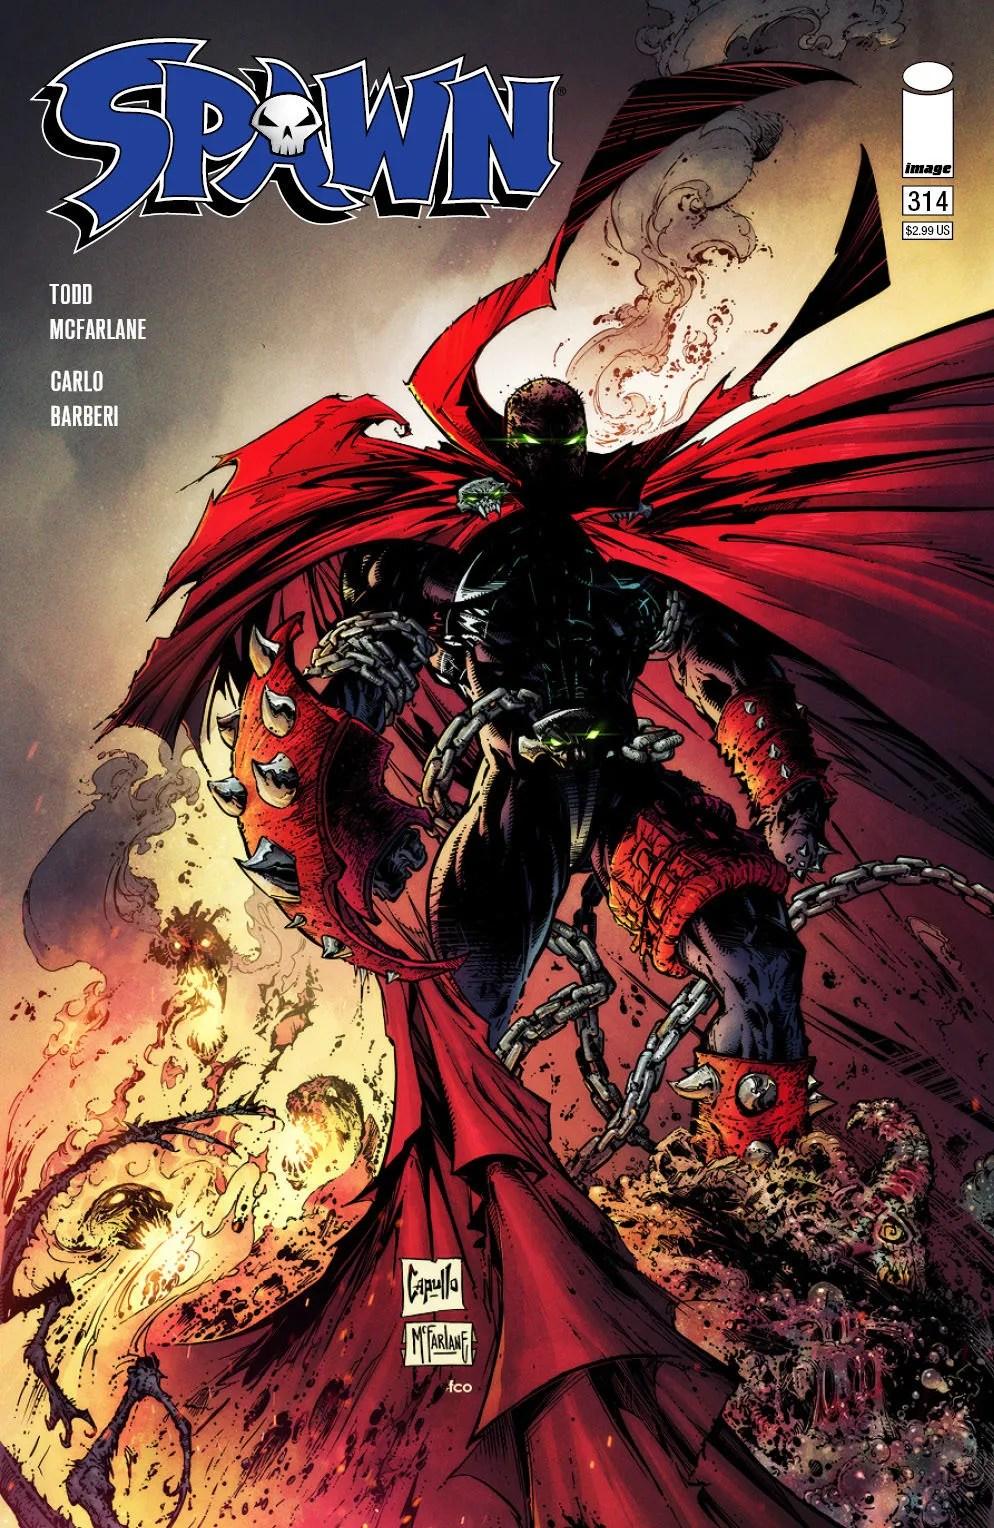 Spawn314_Cover-B_c6815a0147f8285e3b5042ebb3626151 ComicList: Image Comics New Releases for 01/27/2021